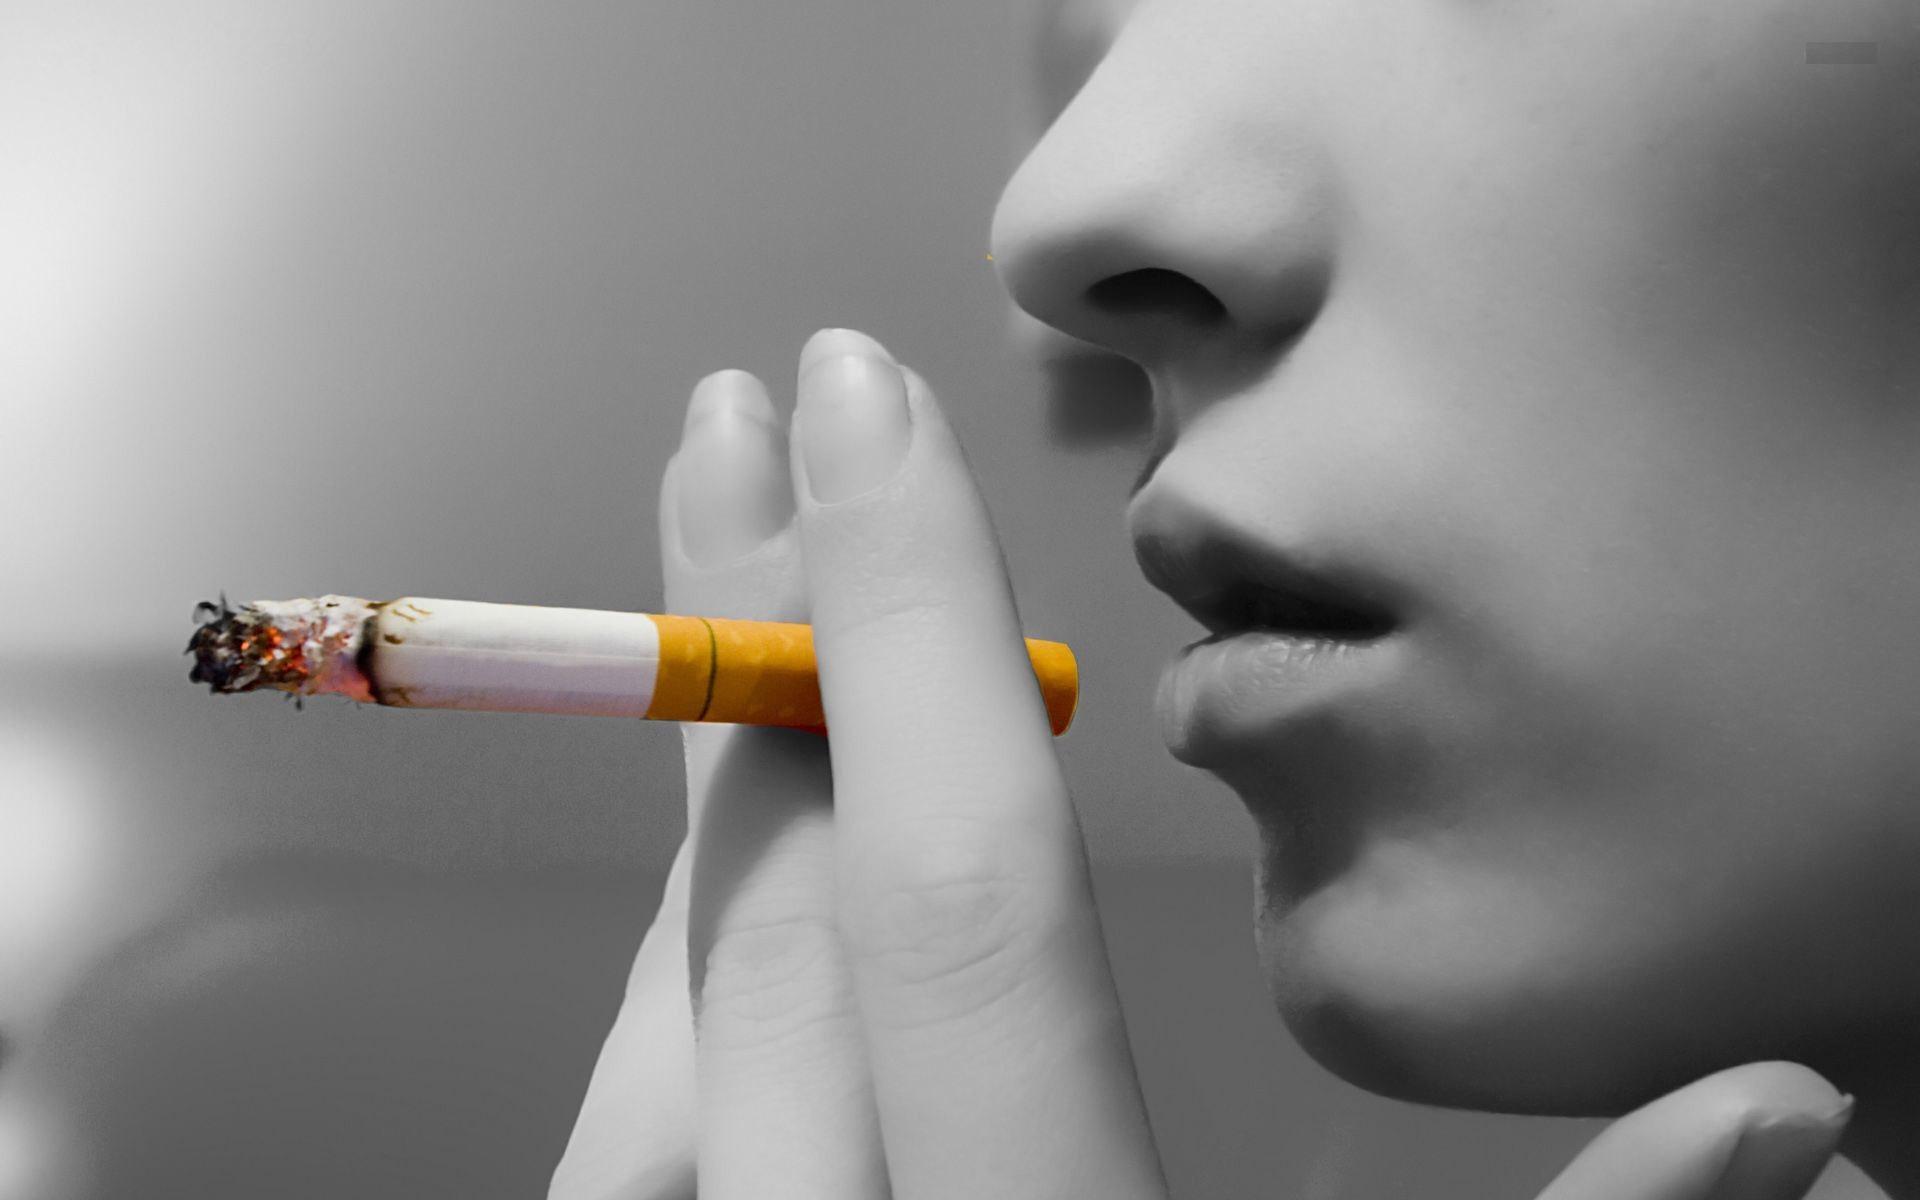 Сонник курить сигарету во сне некурящему